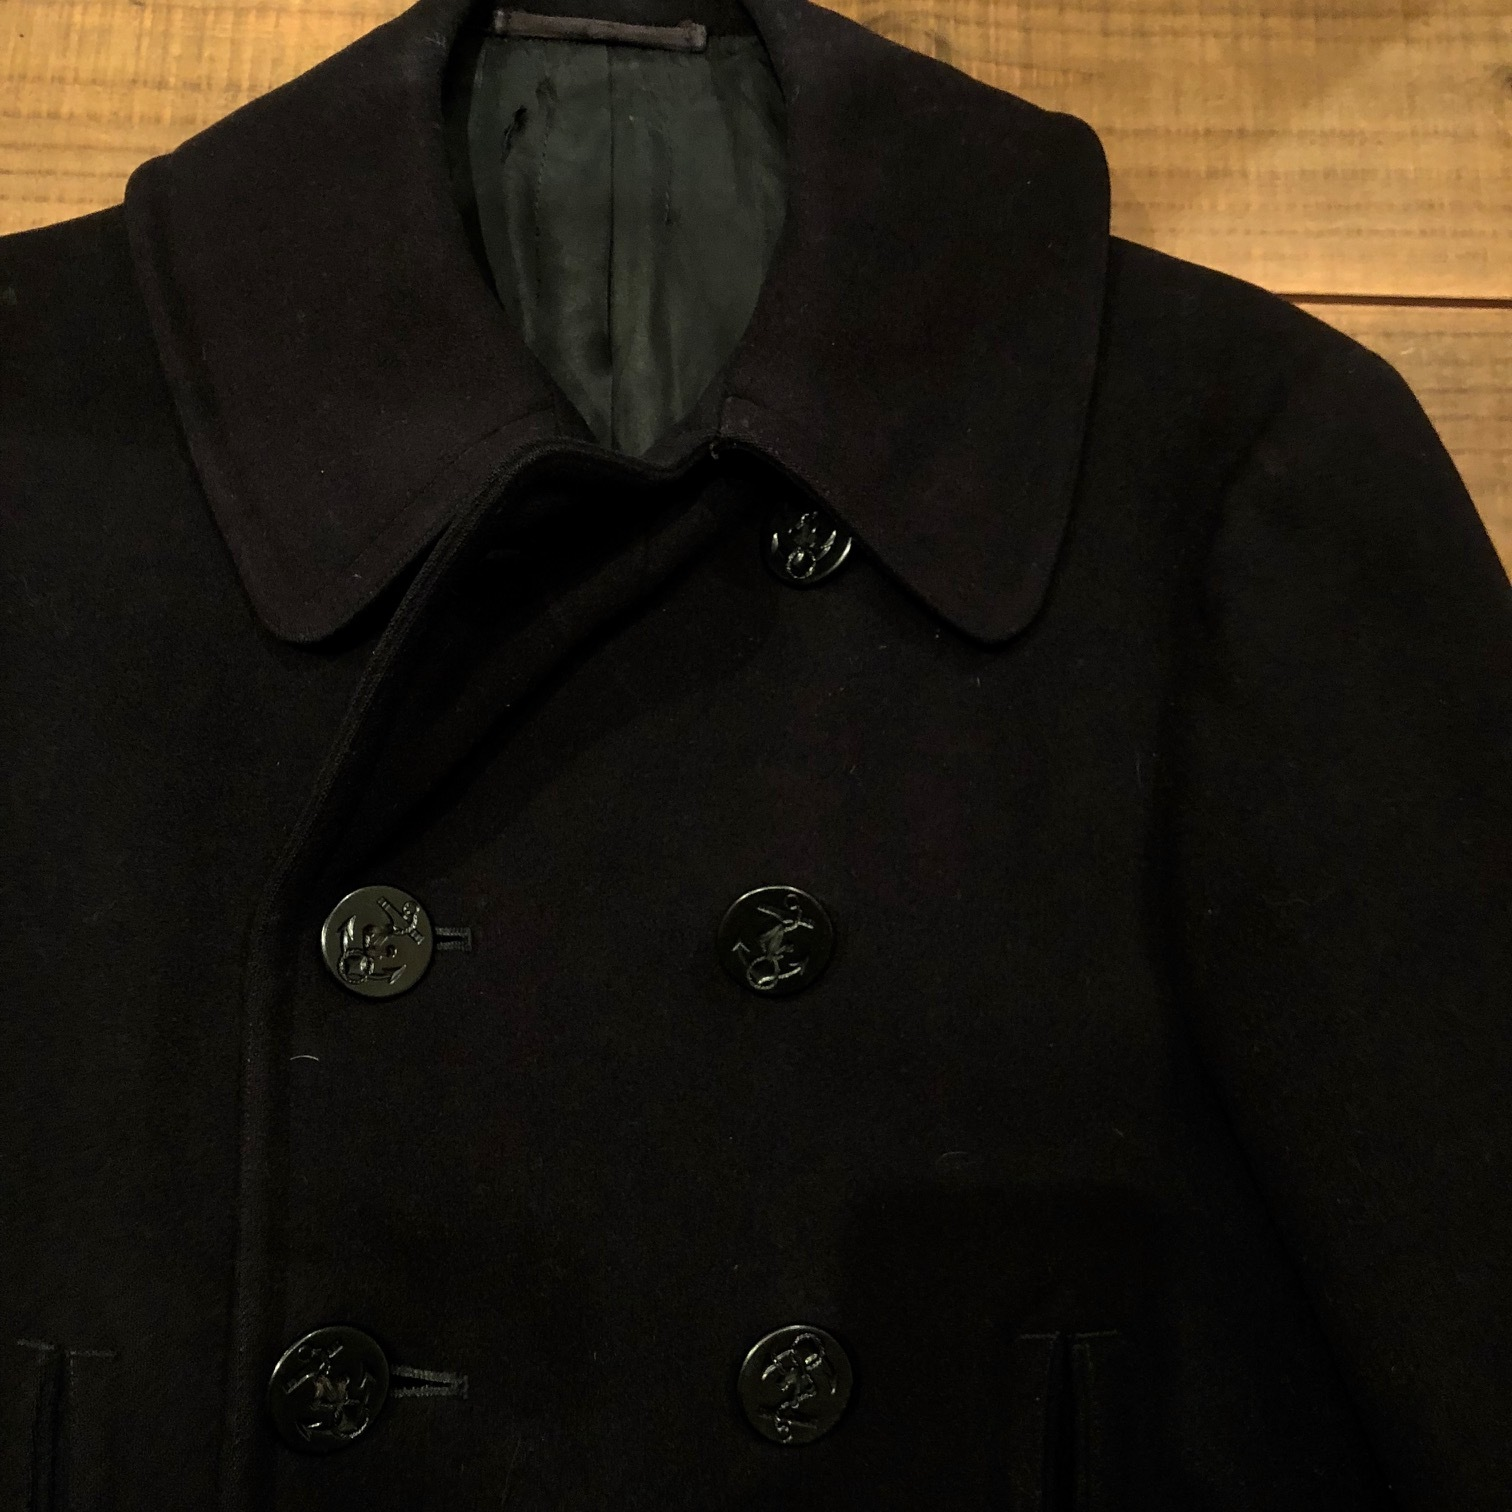 "1940s \"" U.S NAVAL CLOTHING FACTORY \"" - ALL Melton WOOL - Vintage 10 BUTTON P-COAT ._d0172088_17282037.jpg"